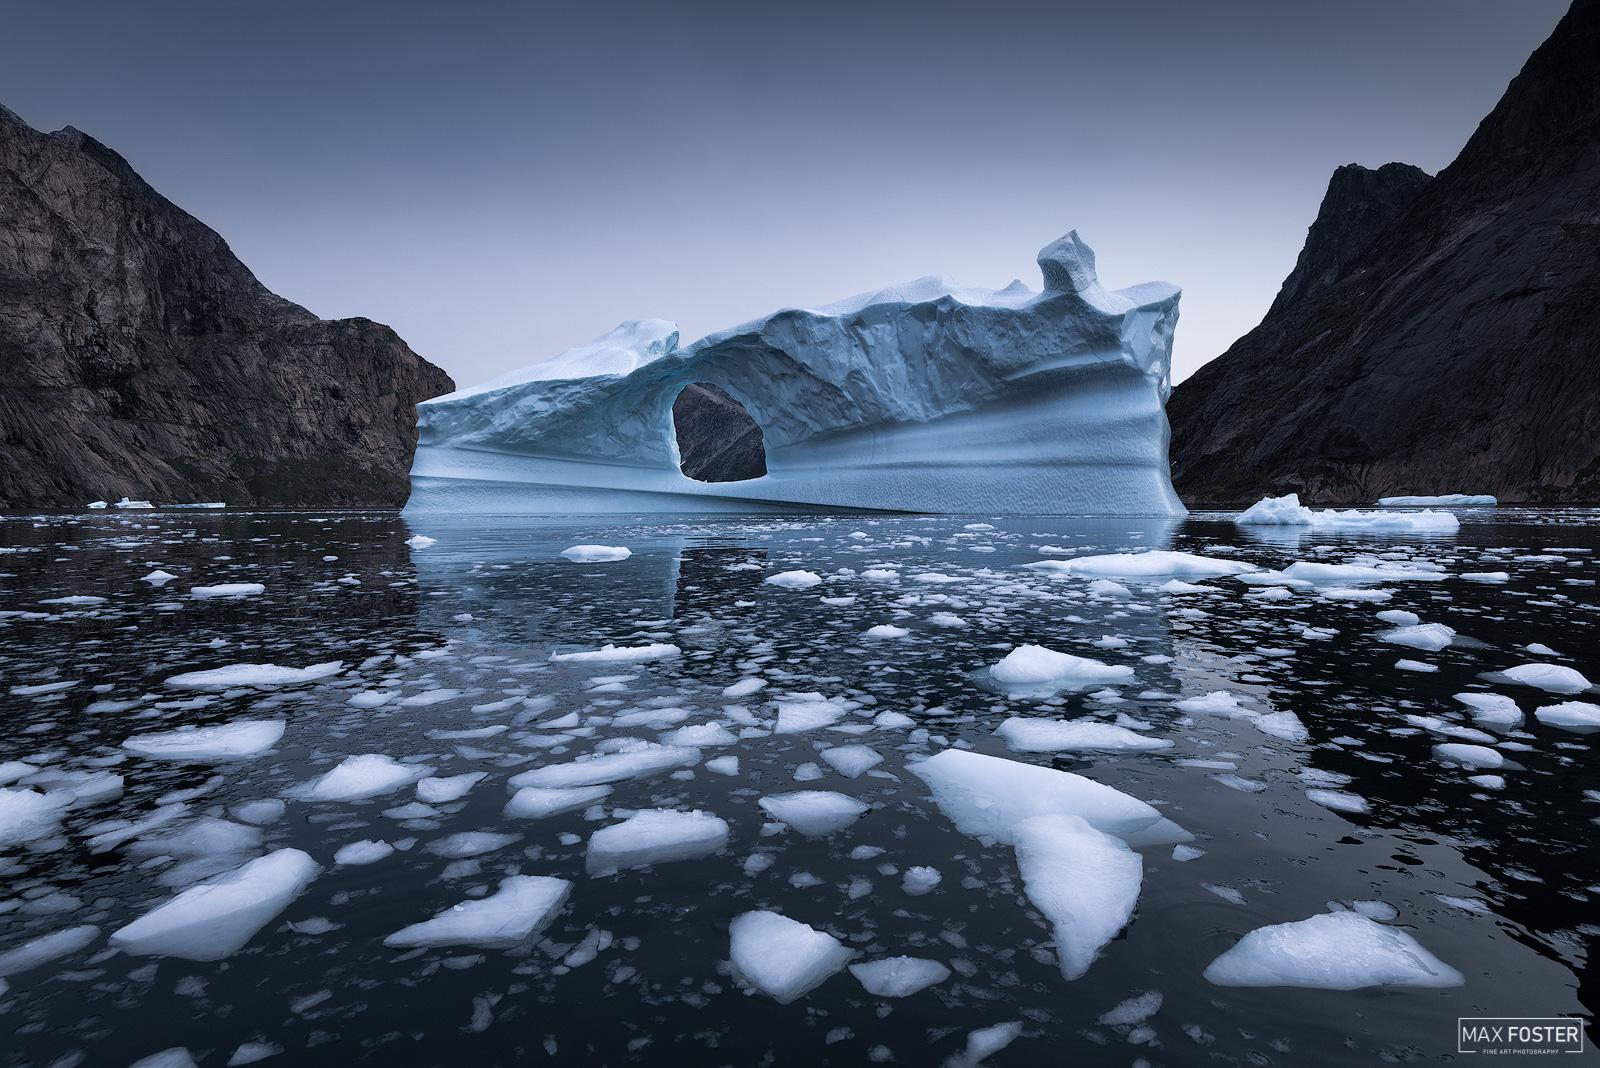 Greenland, Southern Greenland, Shattered, Glacier, Iceberg, Ice Calving, photo